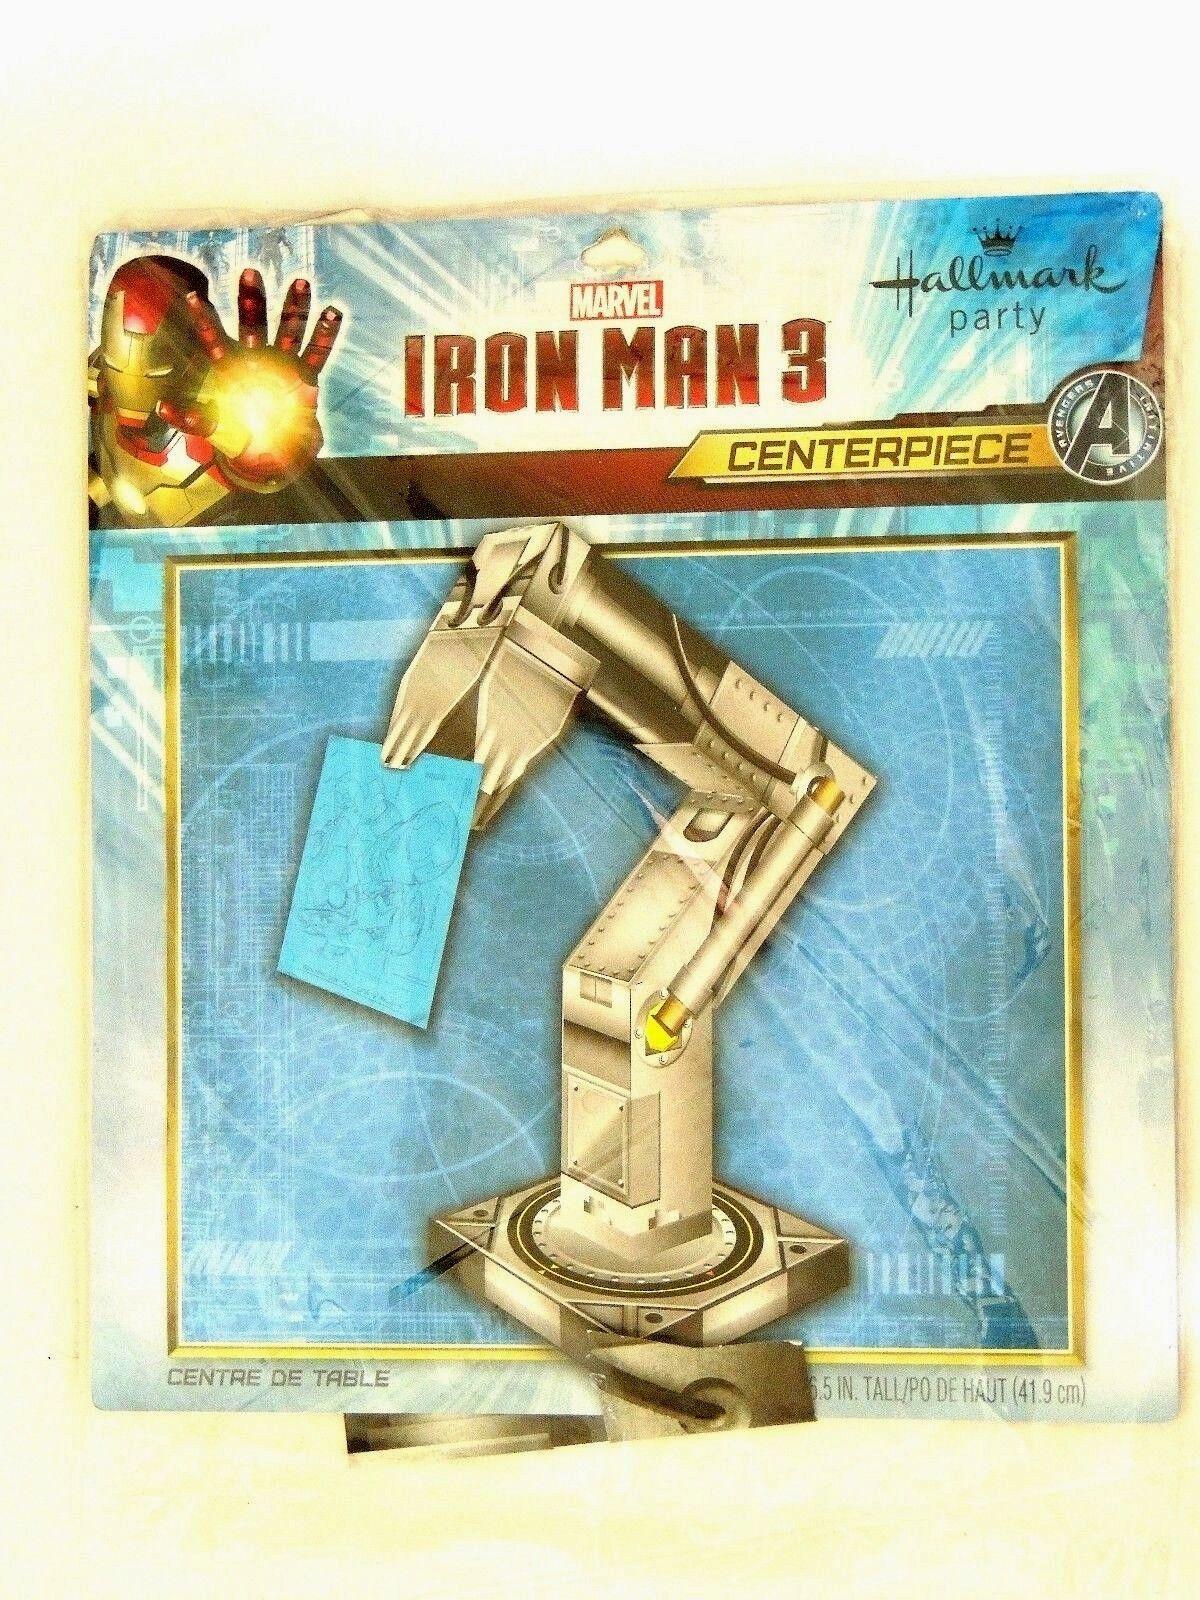 Iron Man 3 Centerpiece BB1CPH3896